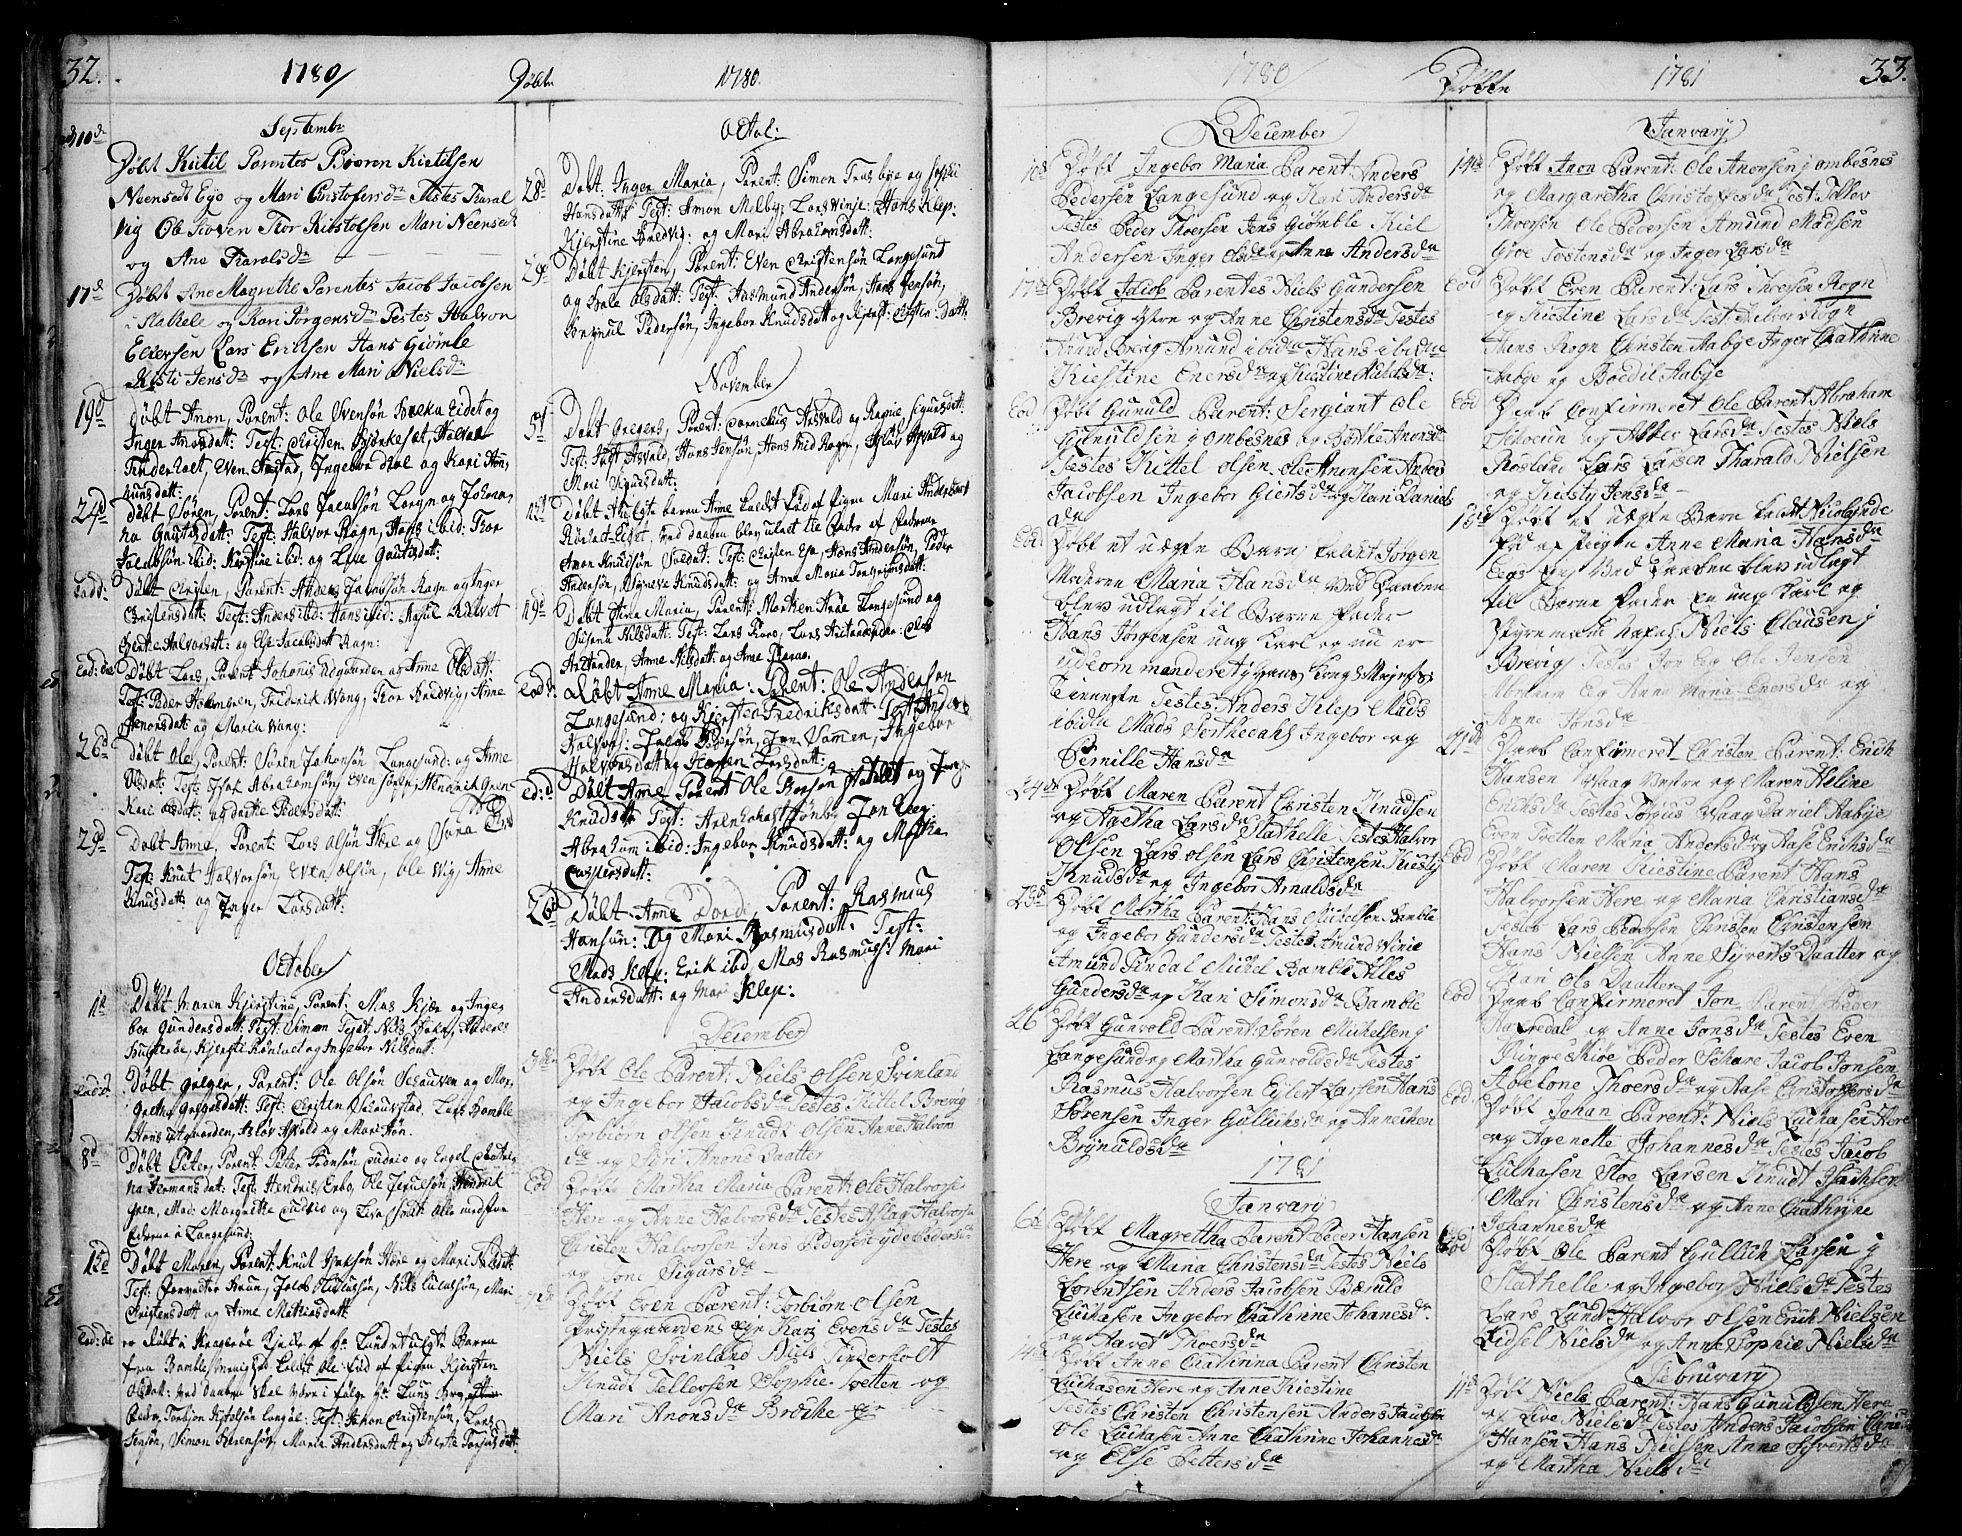 SAKO, Bamble kirkebøker, F/Fa/L0002: Ministerialbok nr. I 2, 1775-1814, s. 32-33